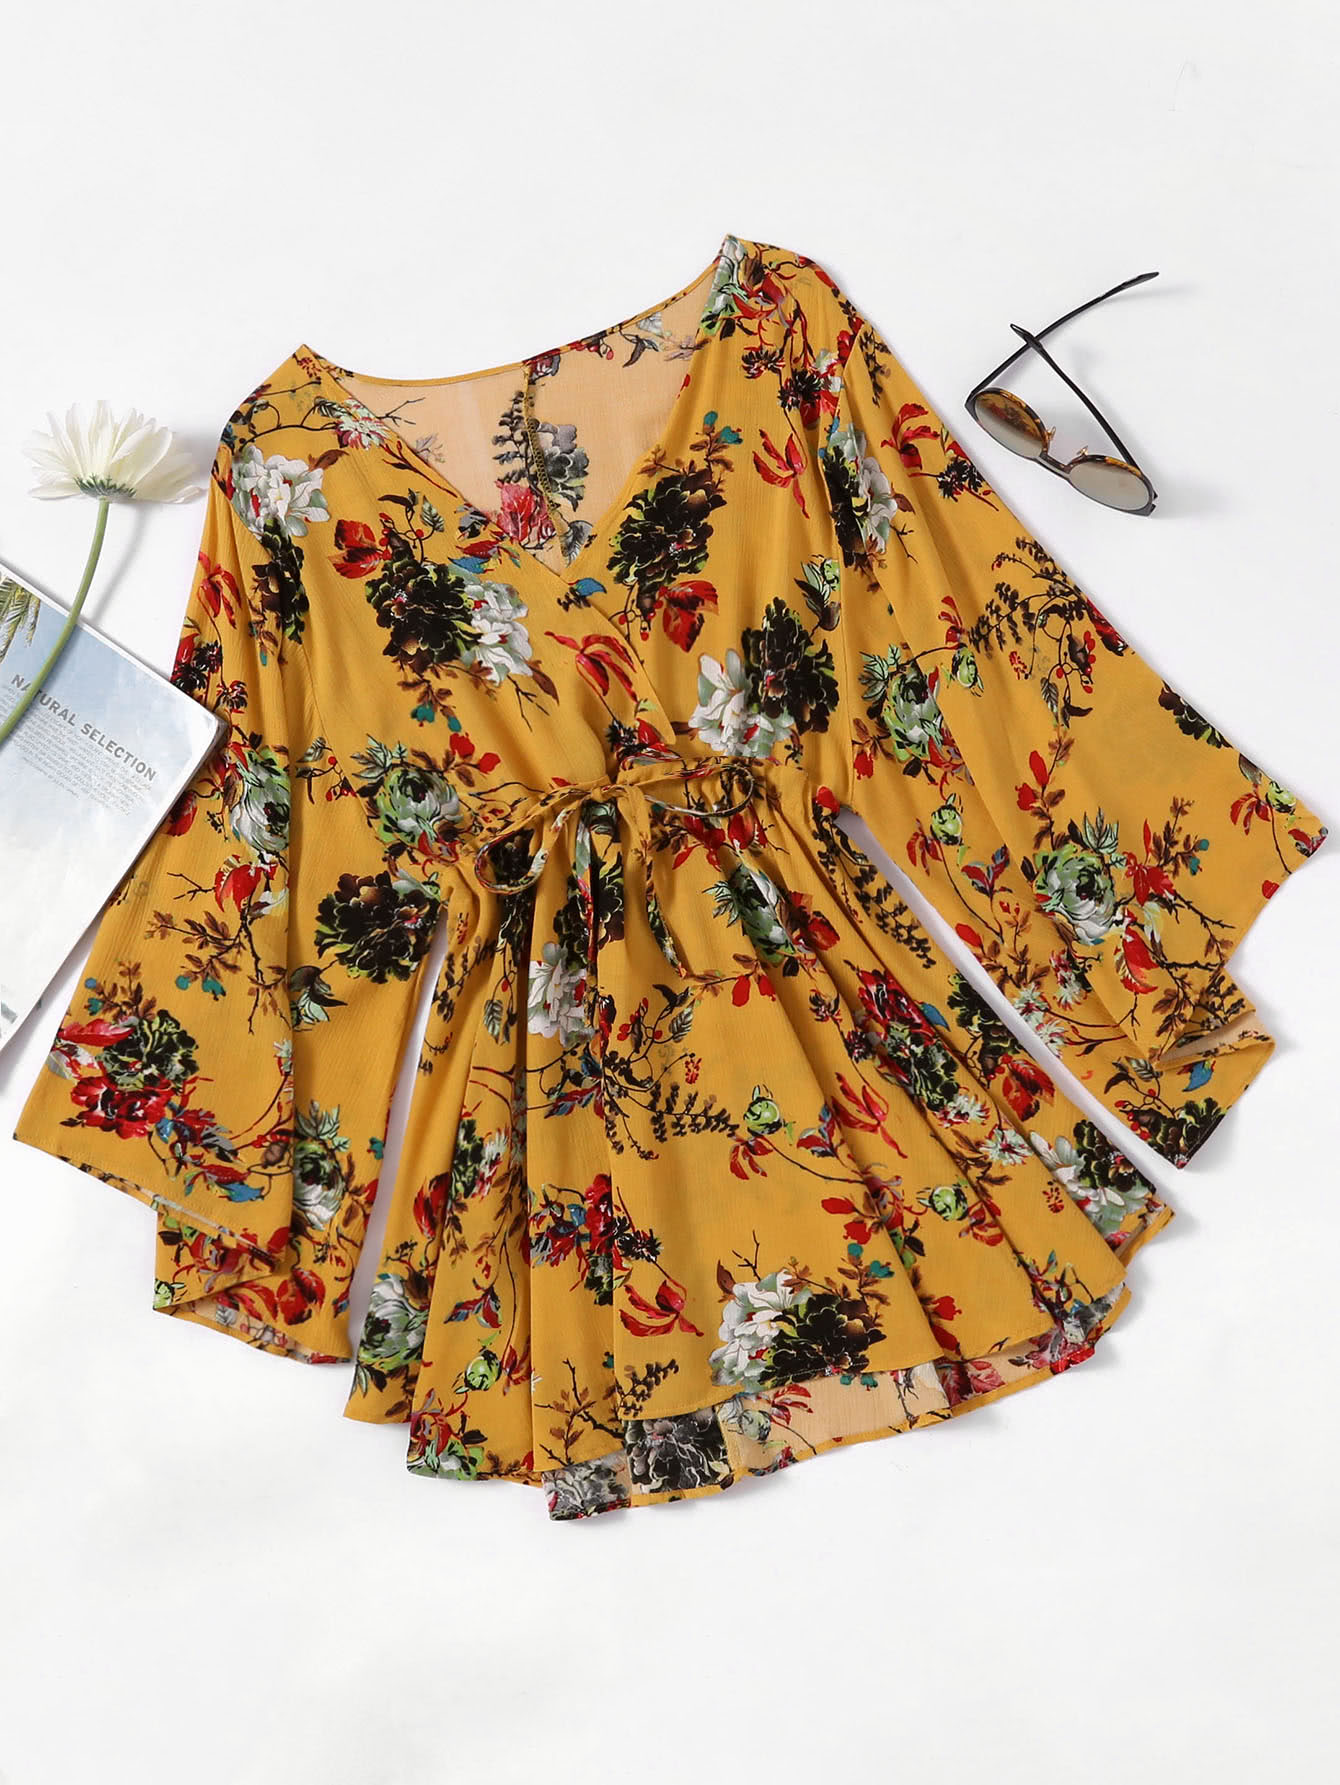 Floral Print Random Surplice Drawstring Waist Dress